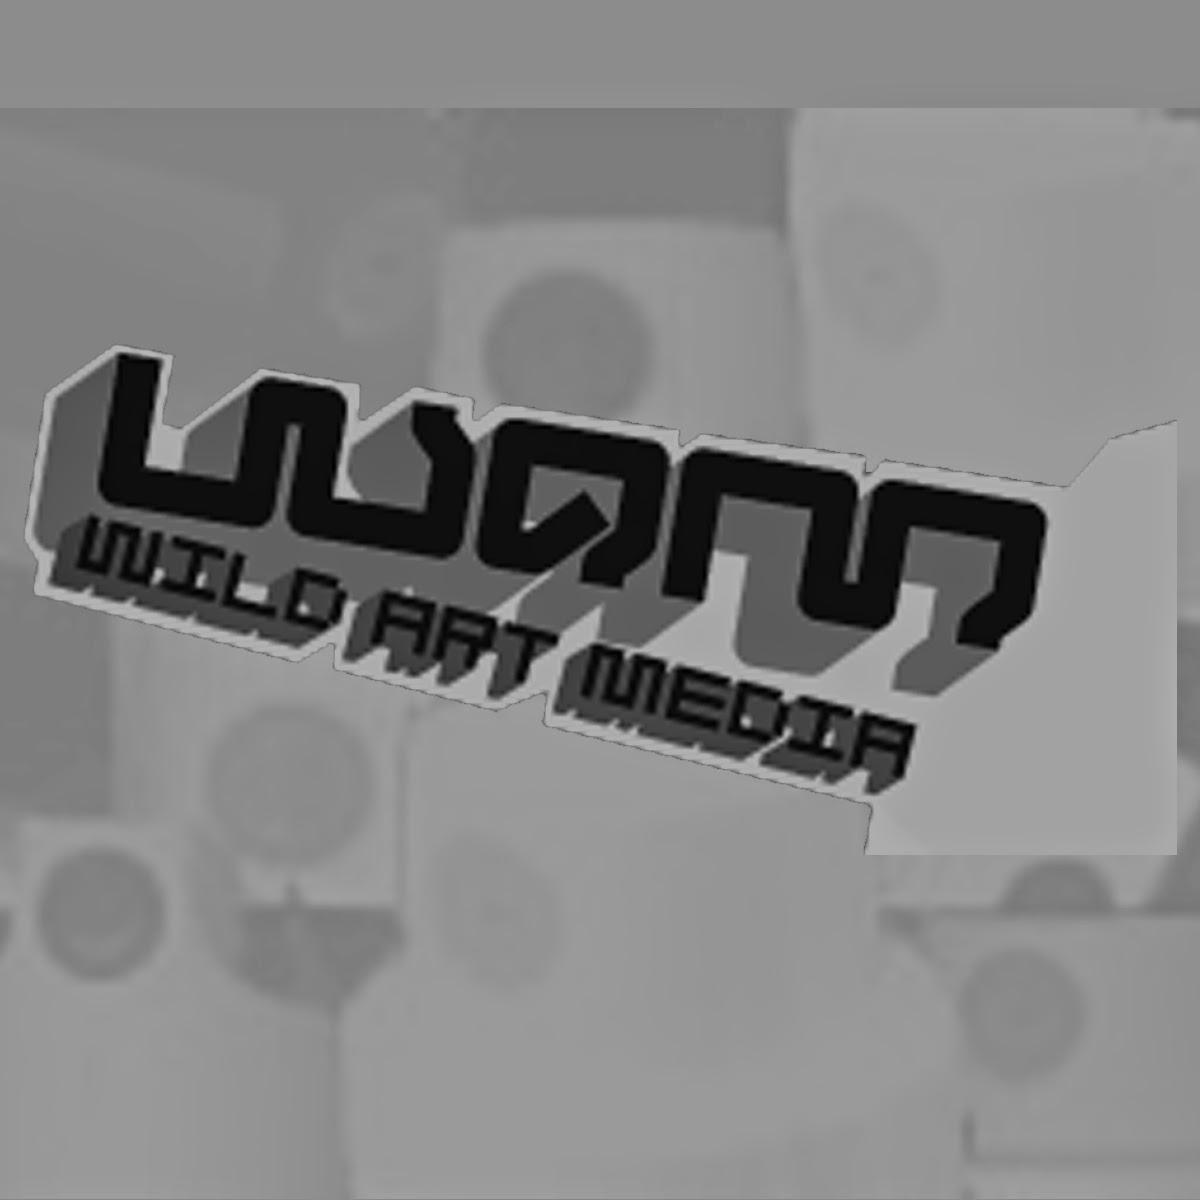 WILD ART MEDIA